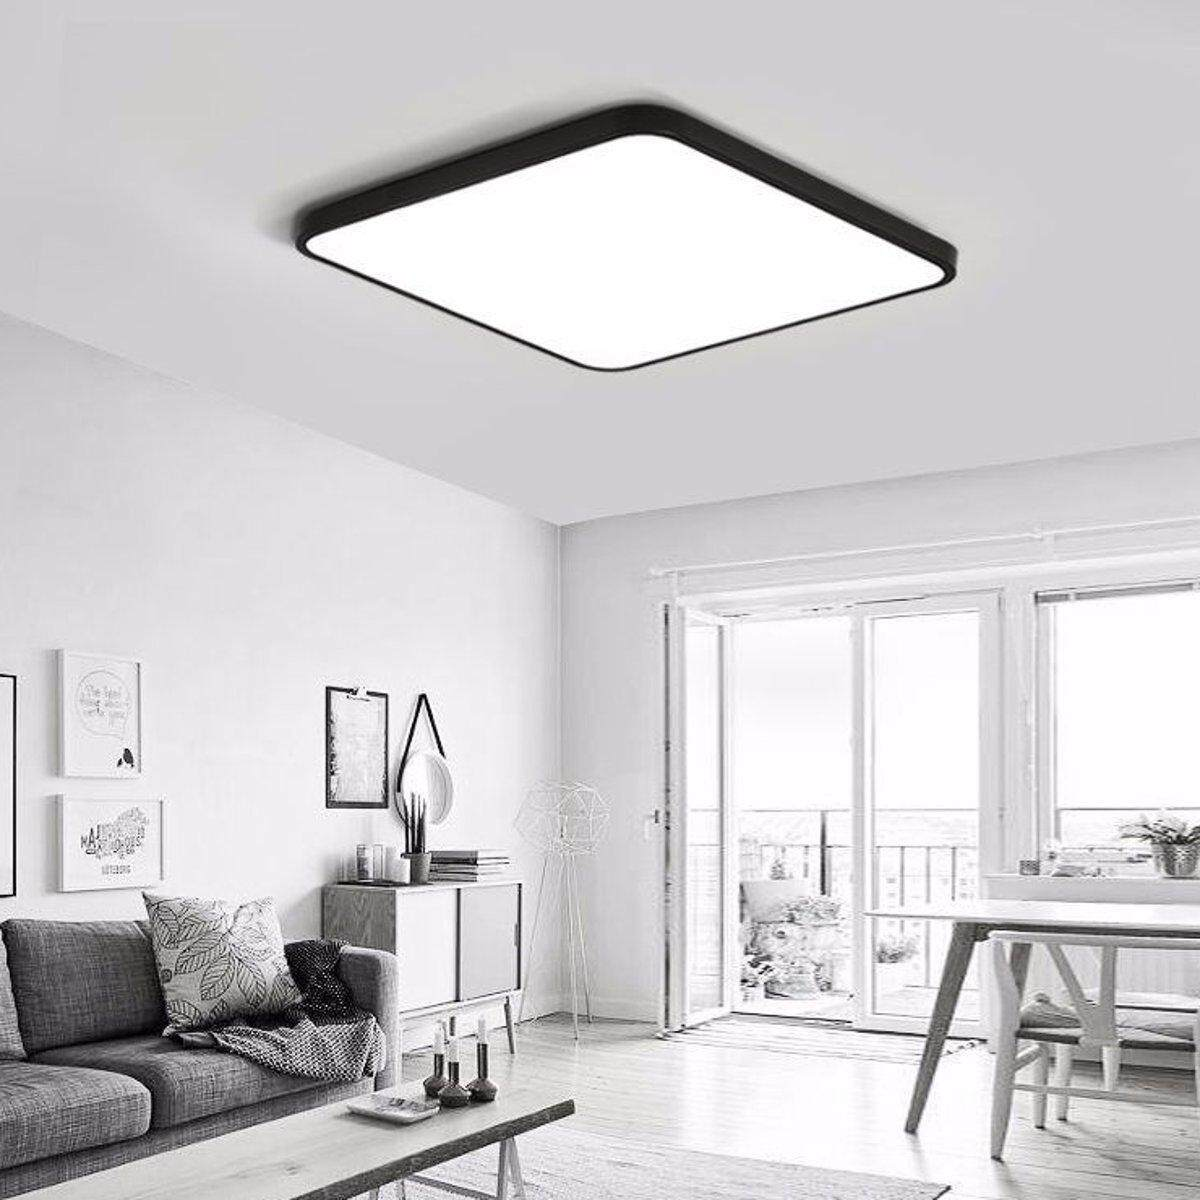 Bright 24W Square LED Ceiling Down Light Panel Wall Kitchen Bathroom Lamp # Black white light